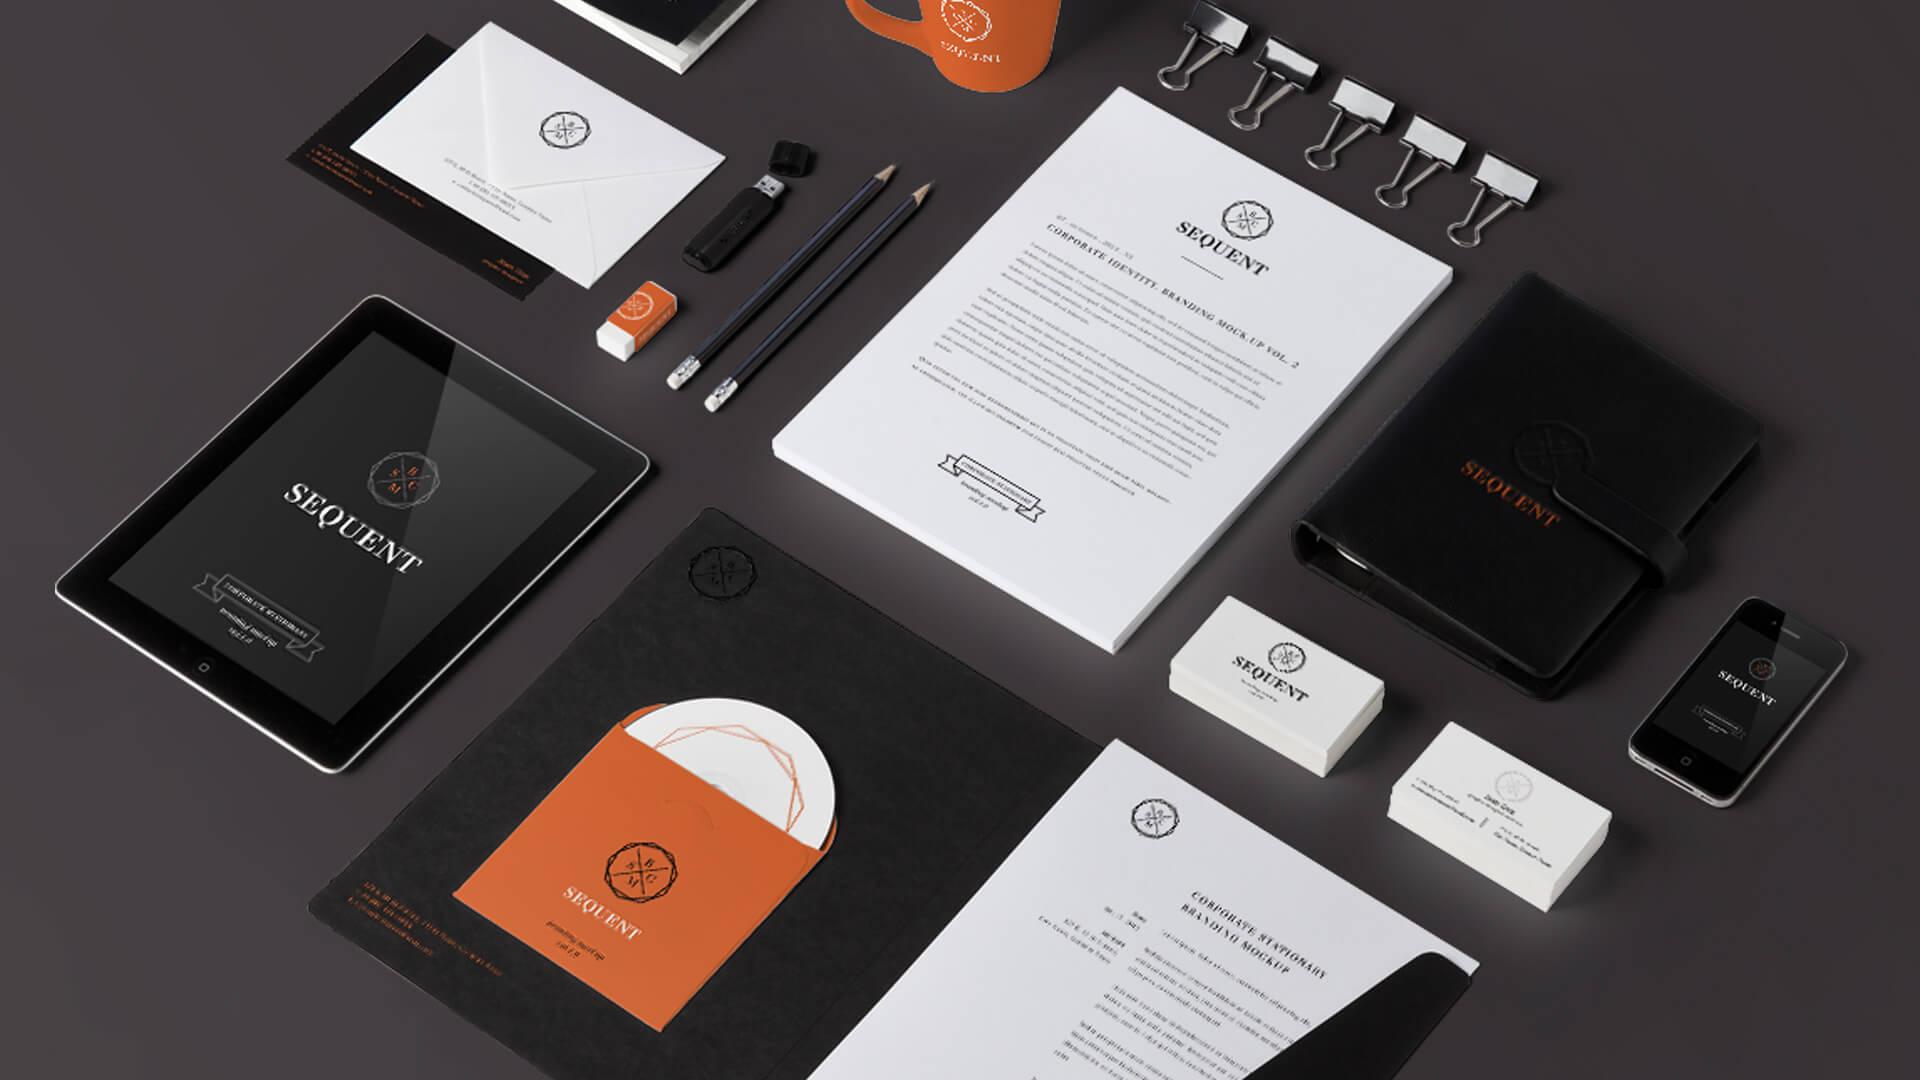 Corporate Identity & Brand Design Inspiration